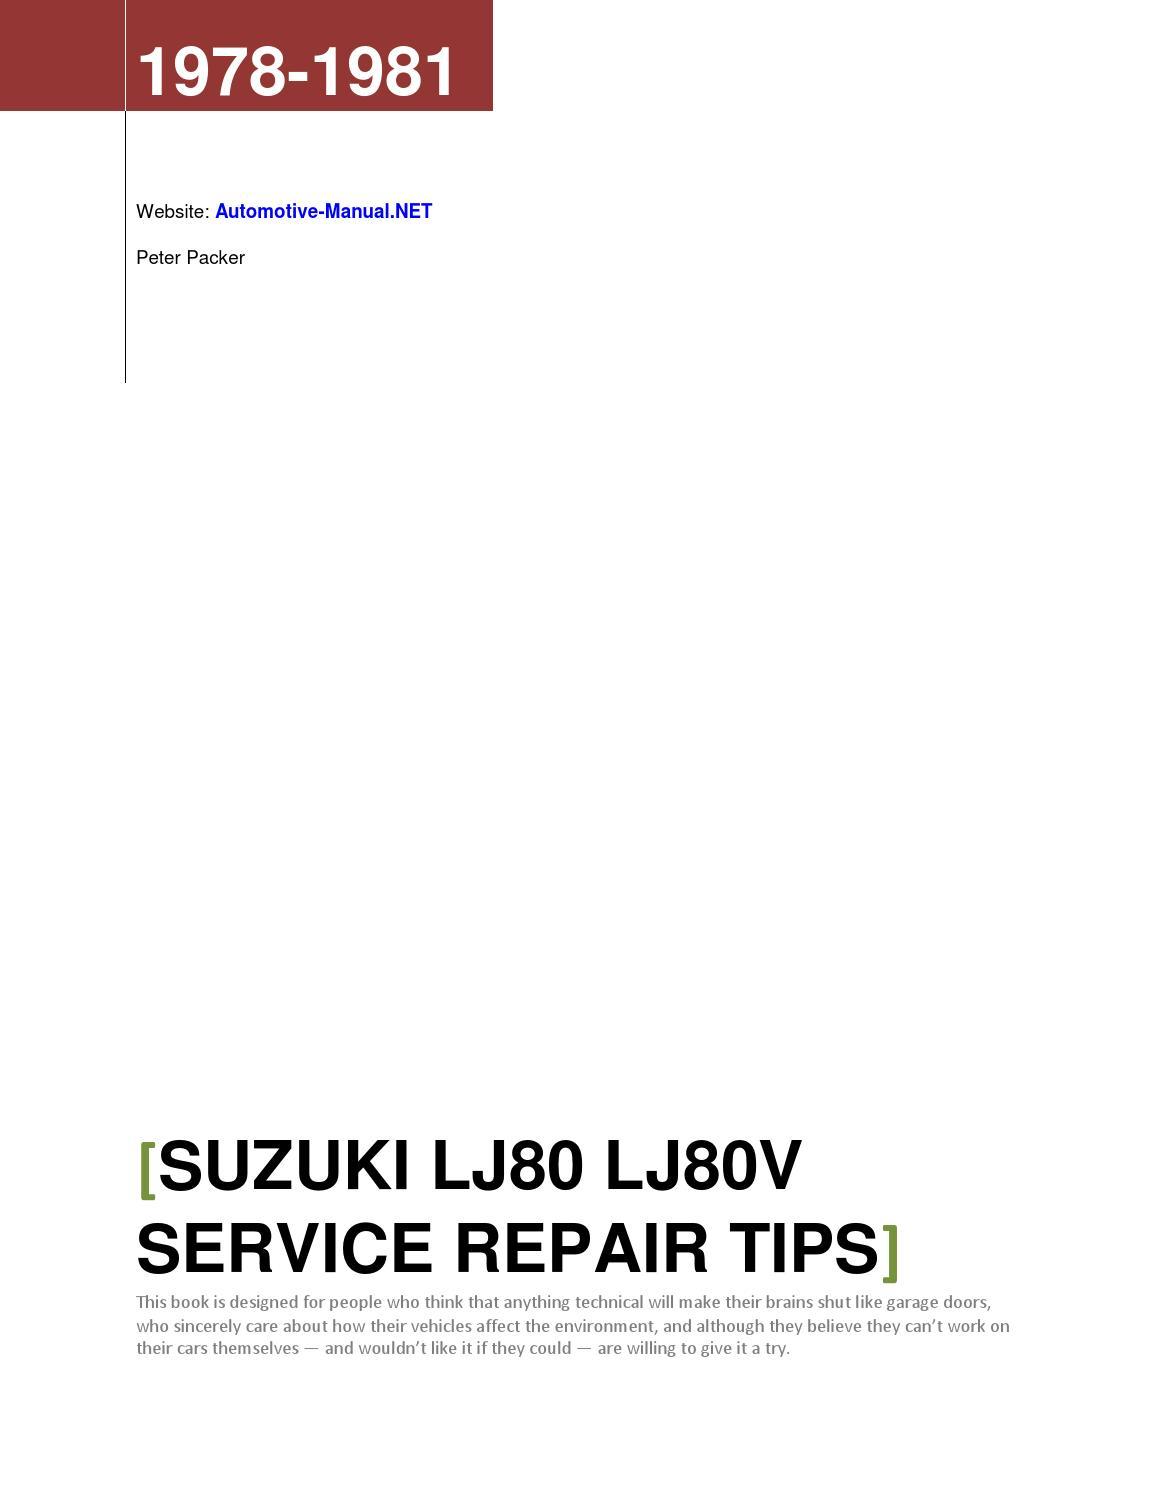 Suzuki LJ80 LJ80V 1978-1981 Service Repair Tips by Armando